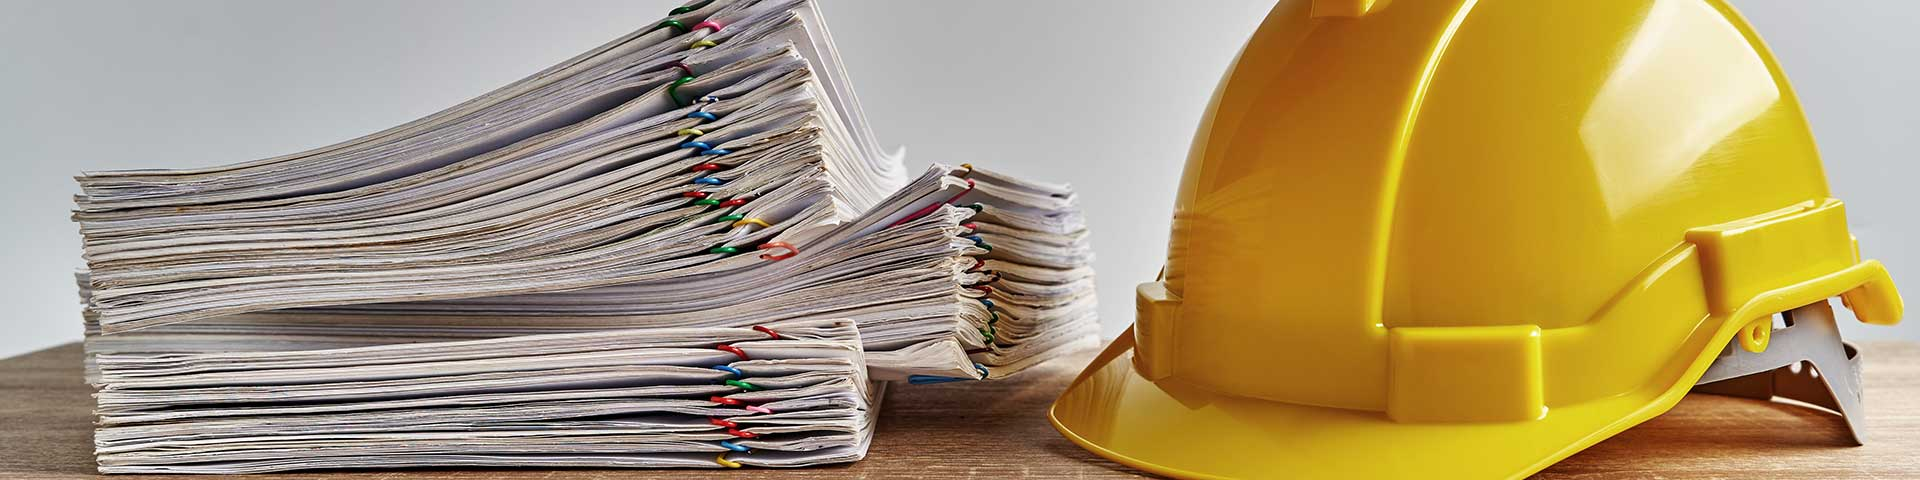 kask budowlany i stos dokumentów leżące na stole